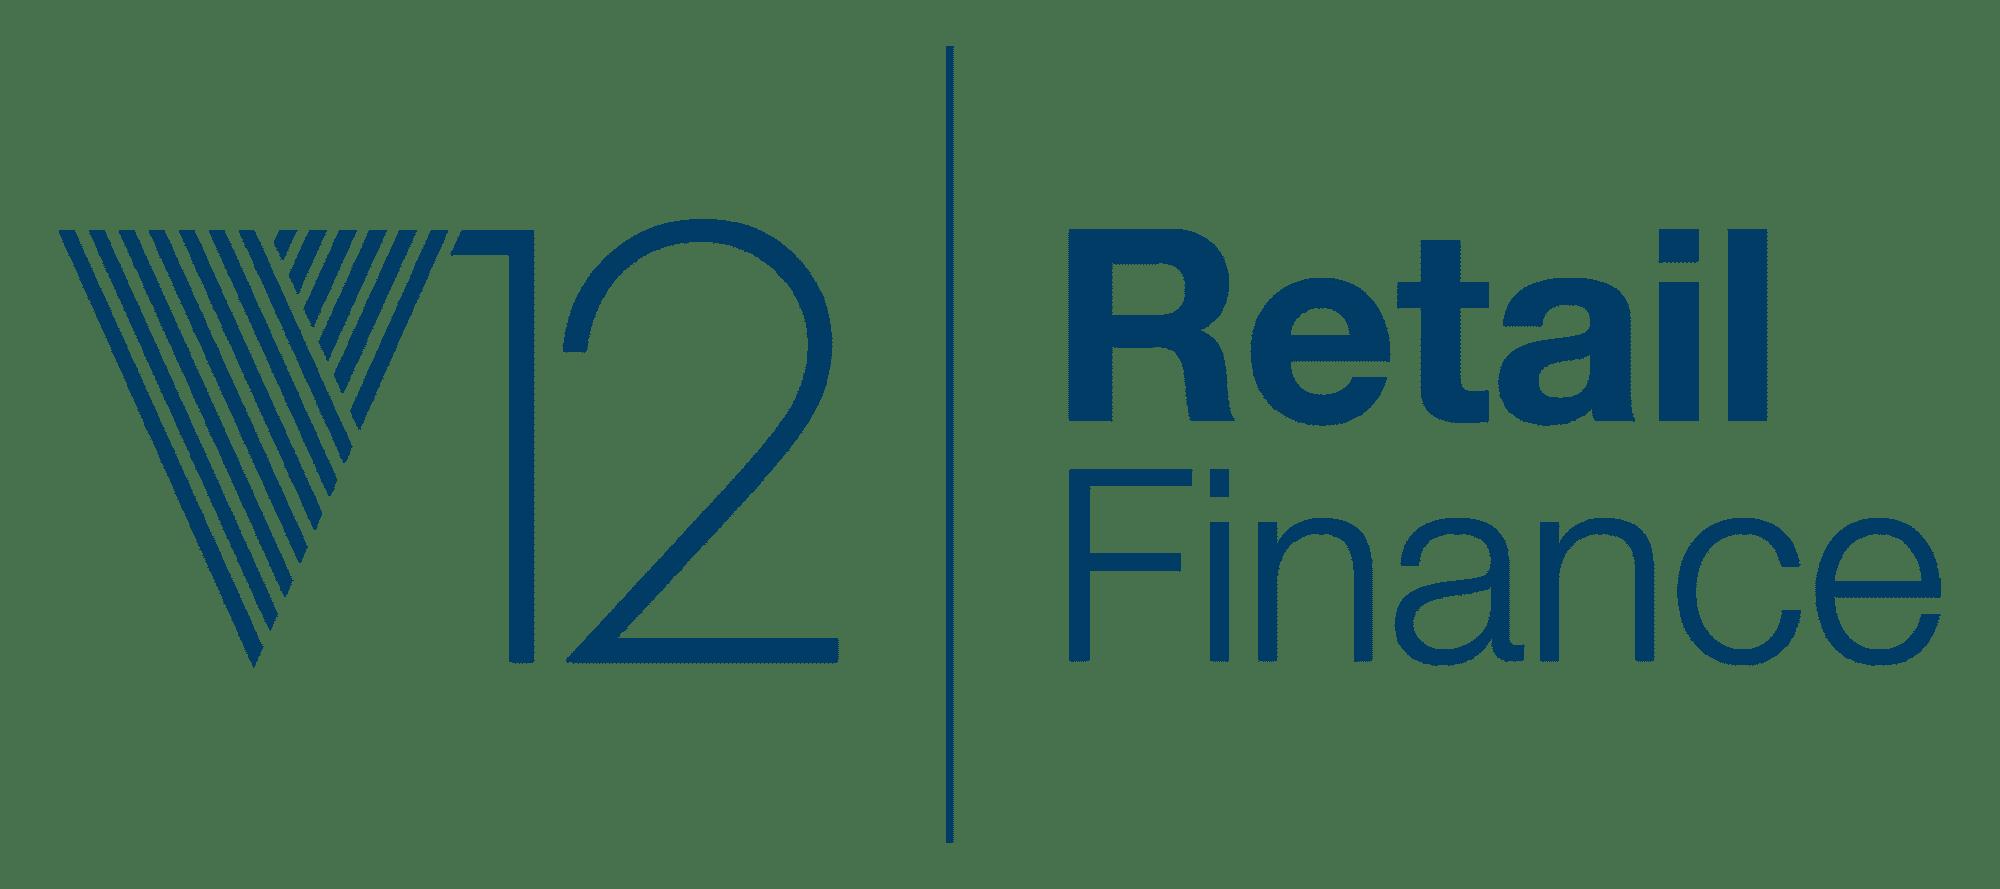 V12 RetalFinance Logo Blue - Finance